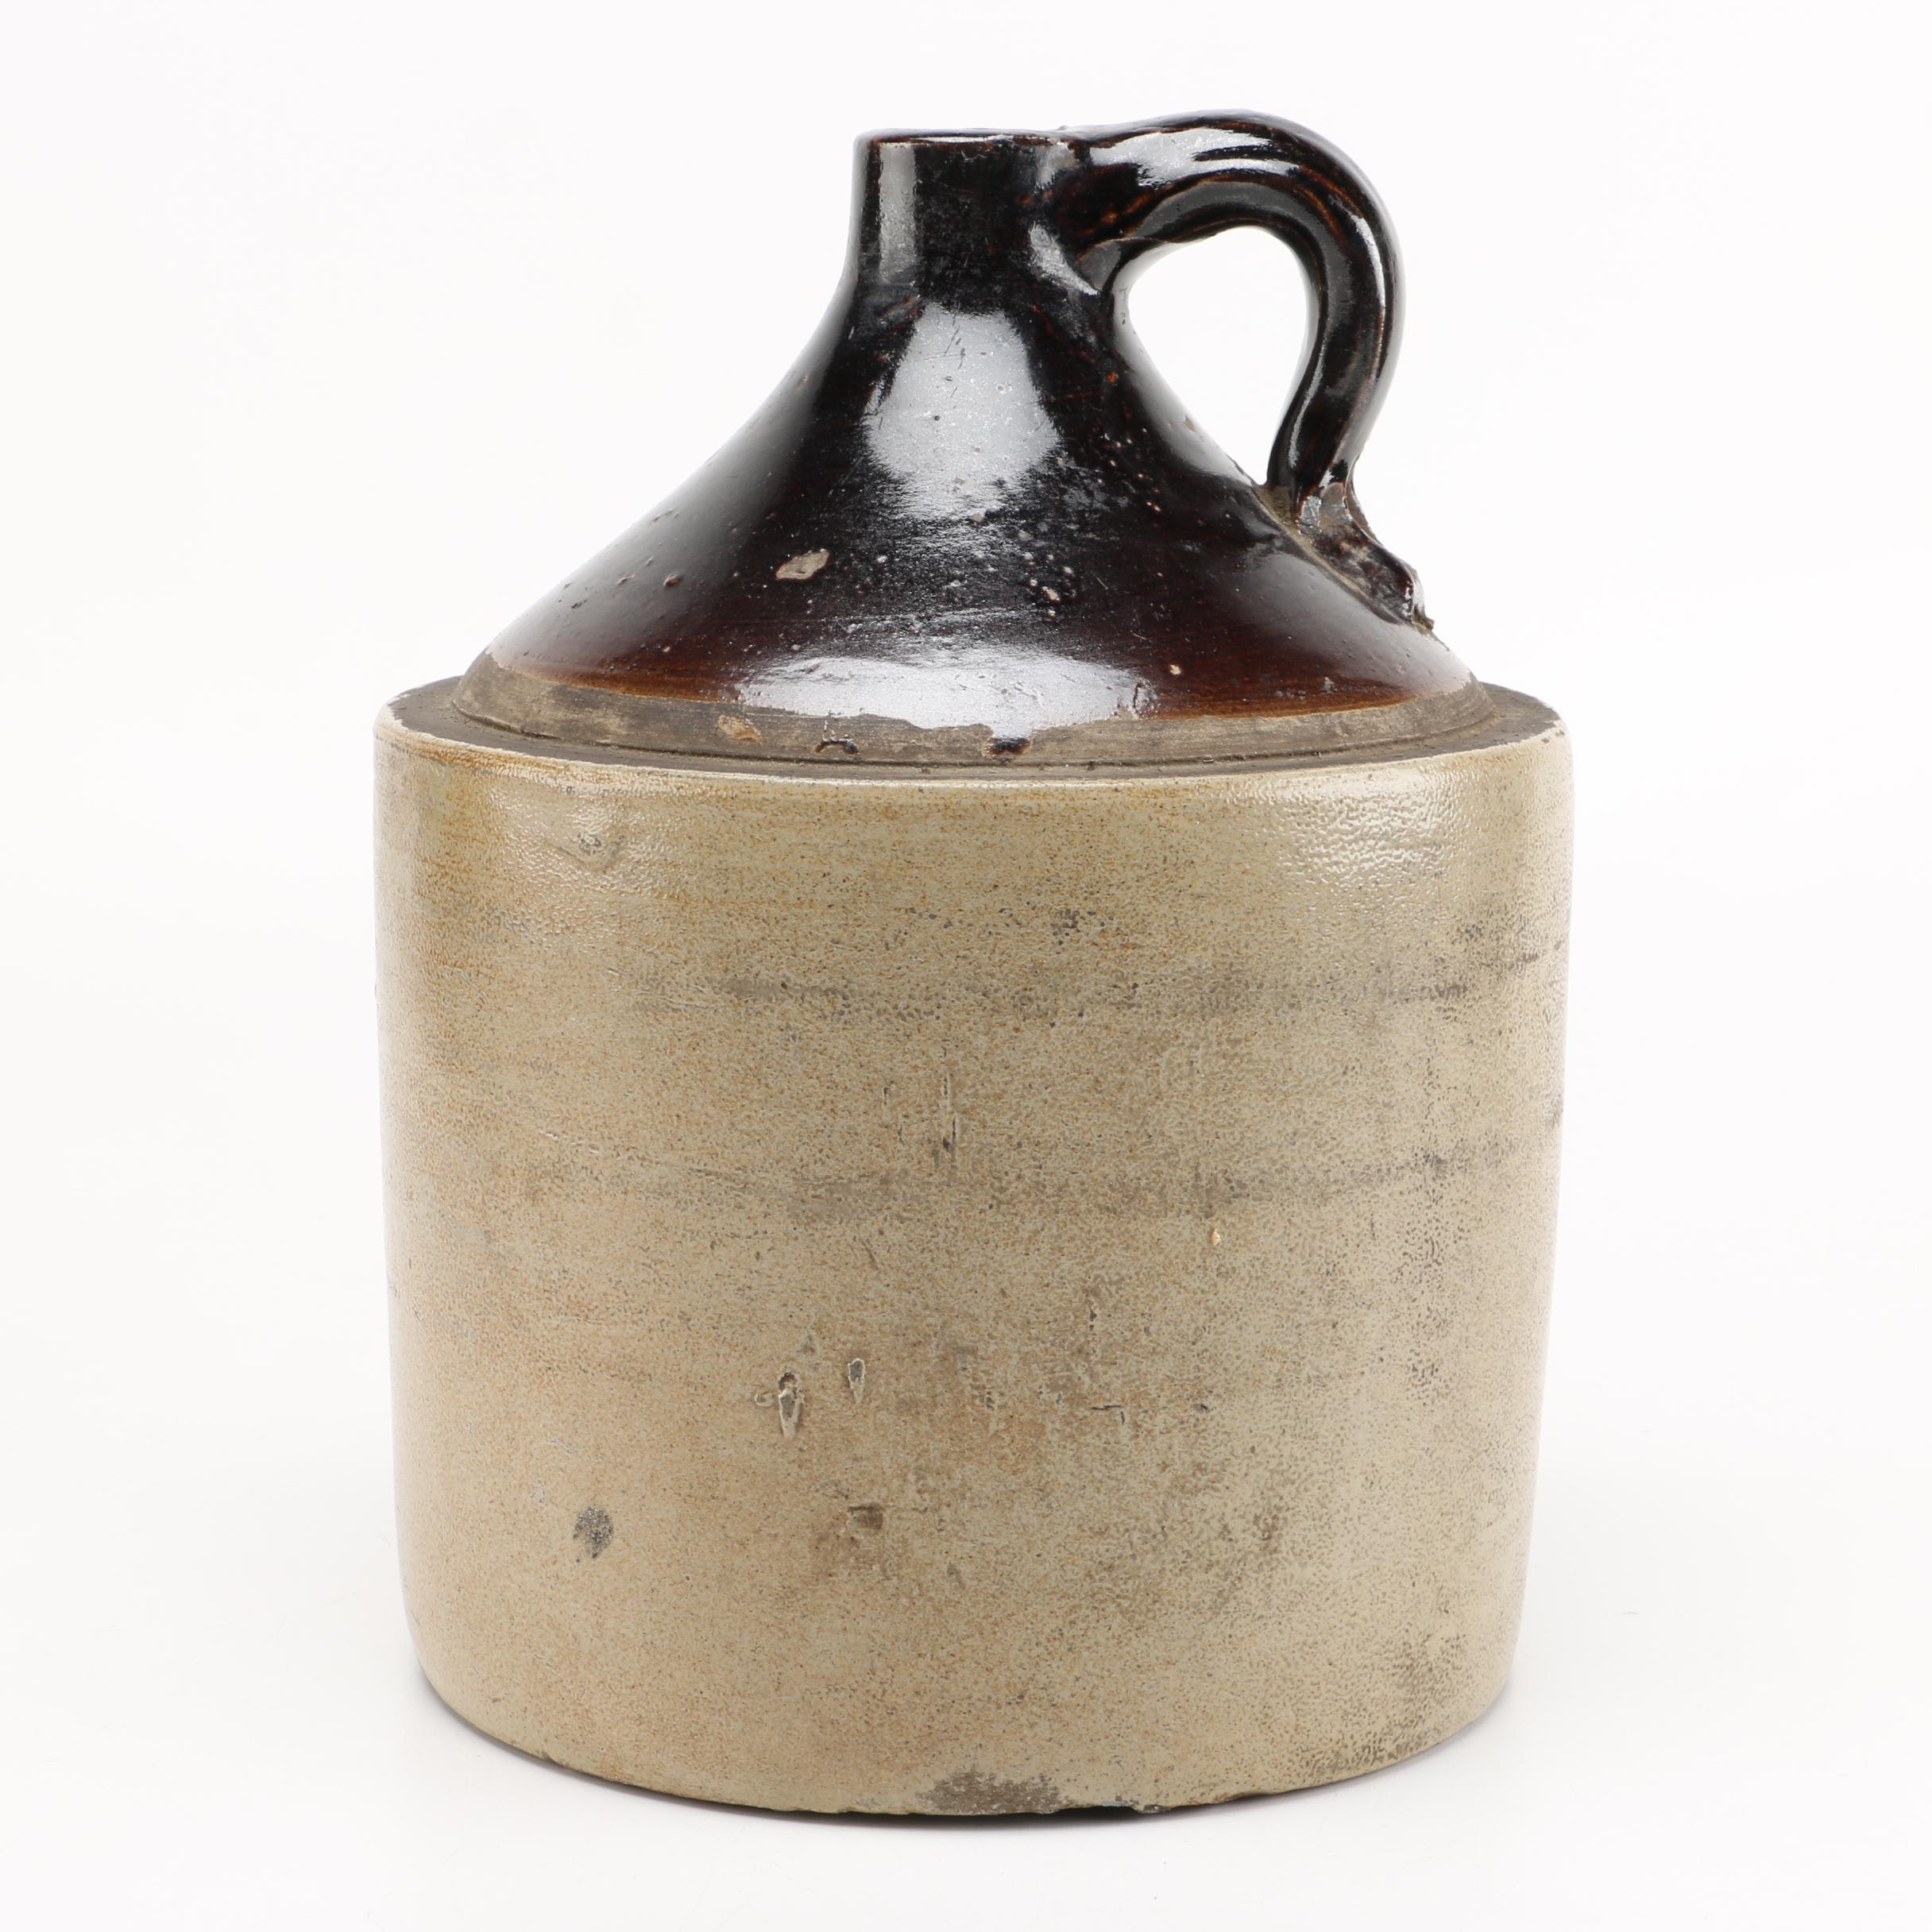 Vintage Stoneware Crock Jug